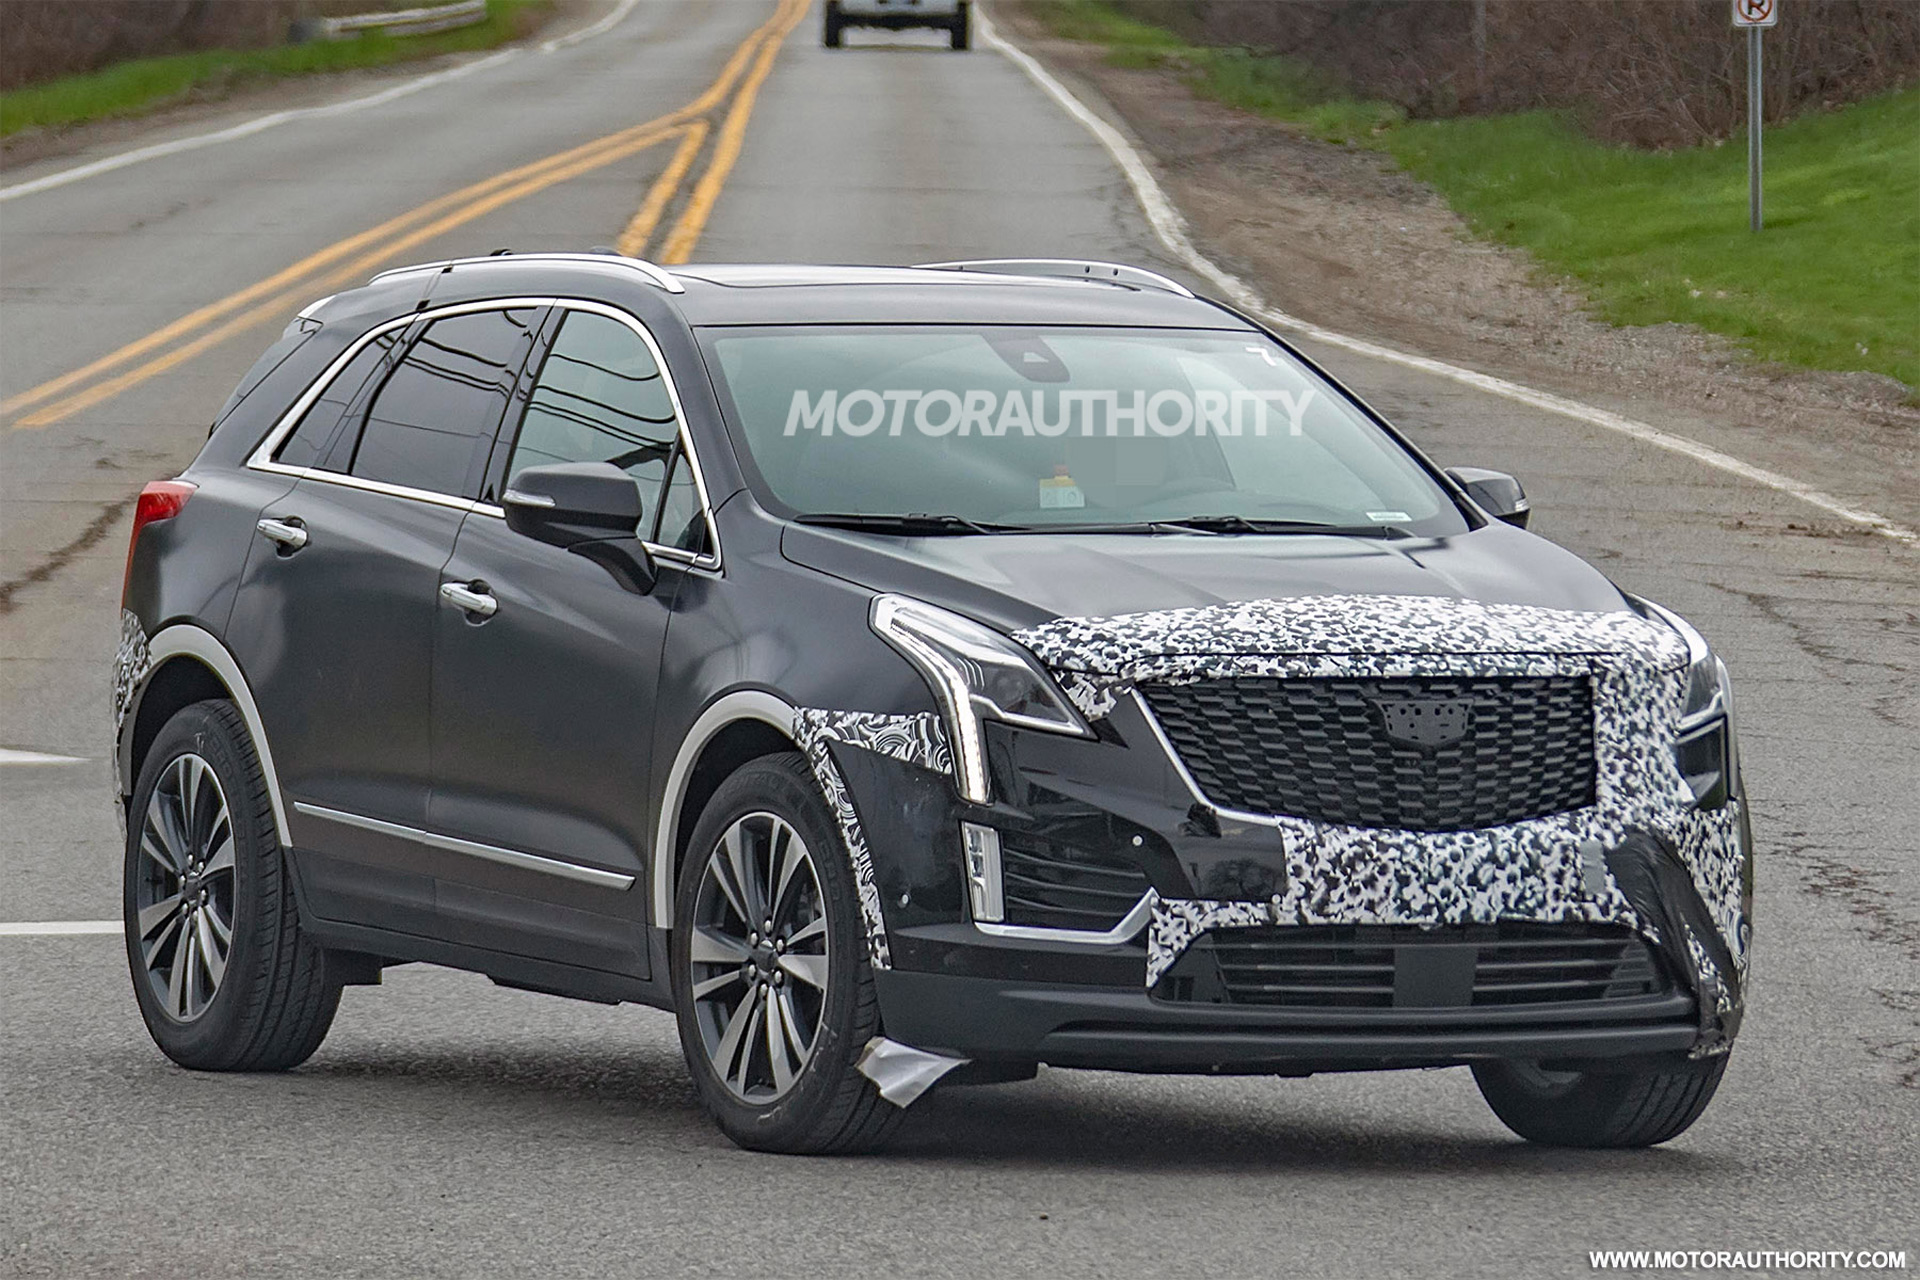 2020 Spy Shots Cadillac Xt5 New Model and Performance